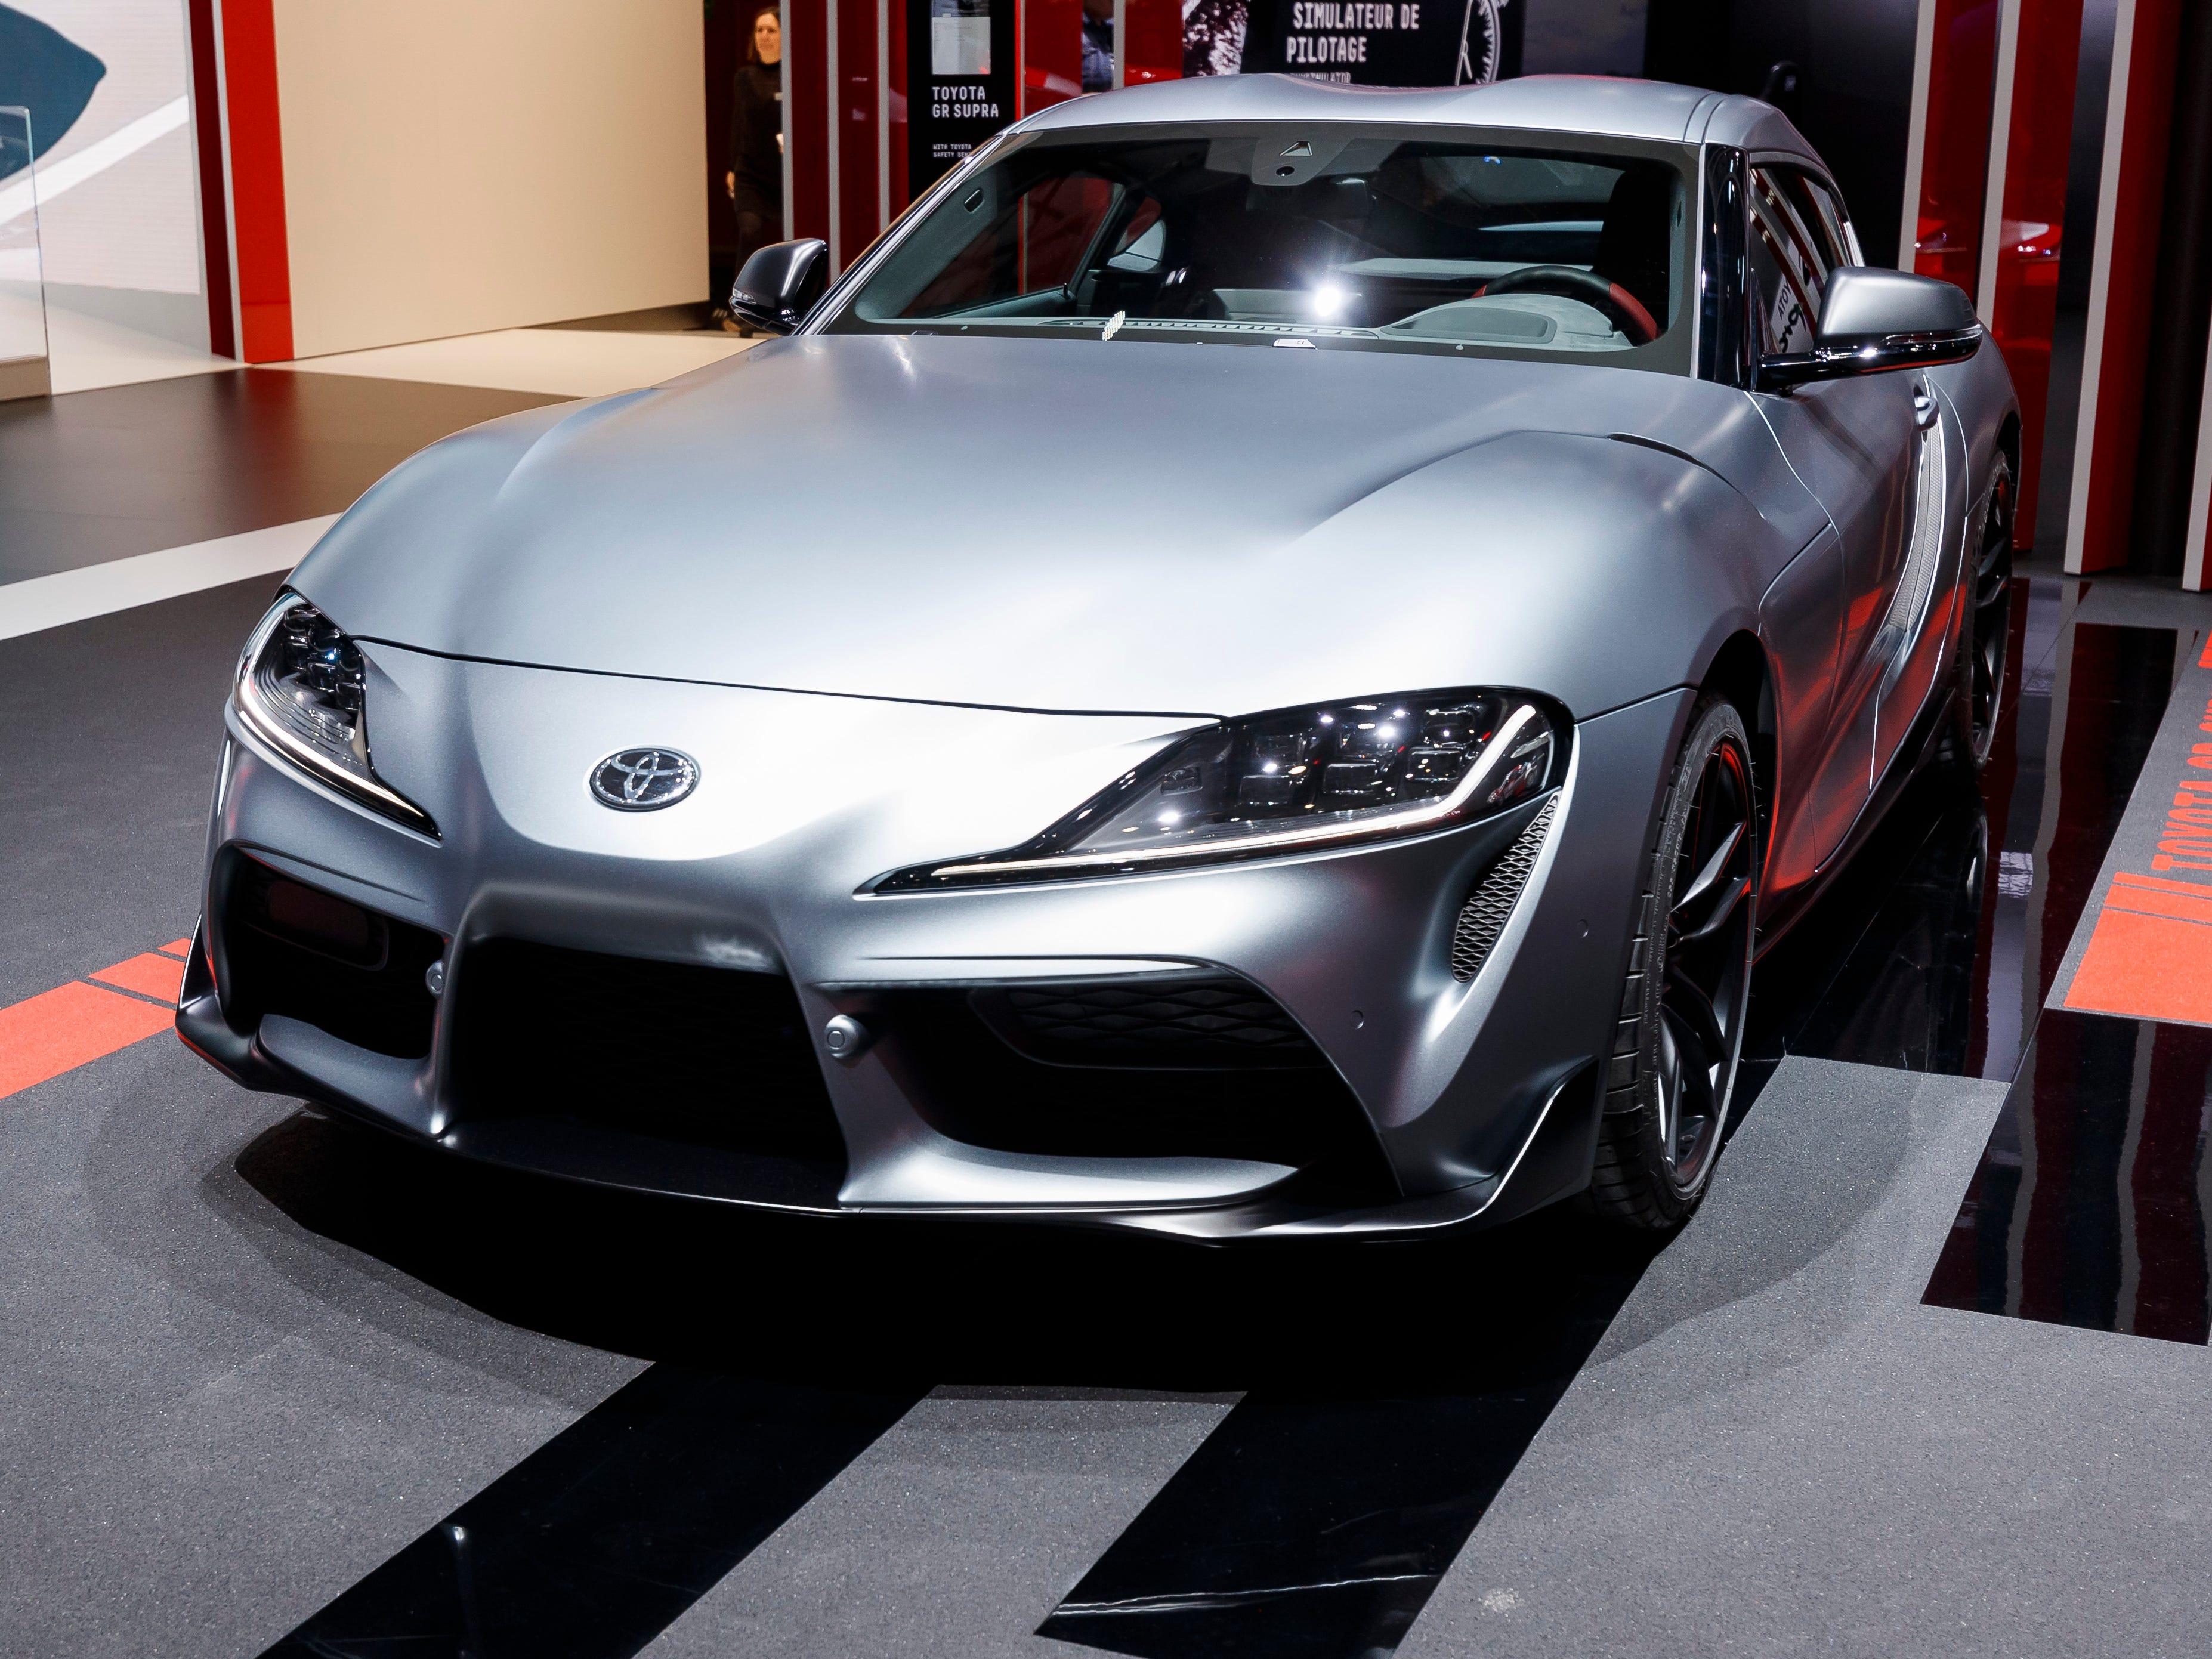 The Toyota GR Supra